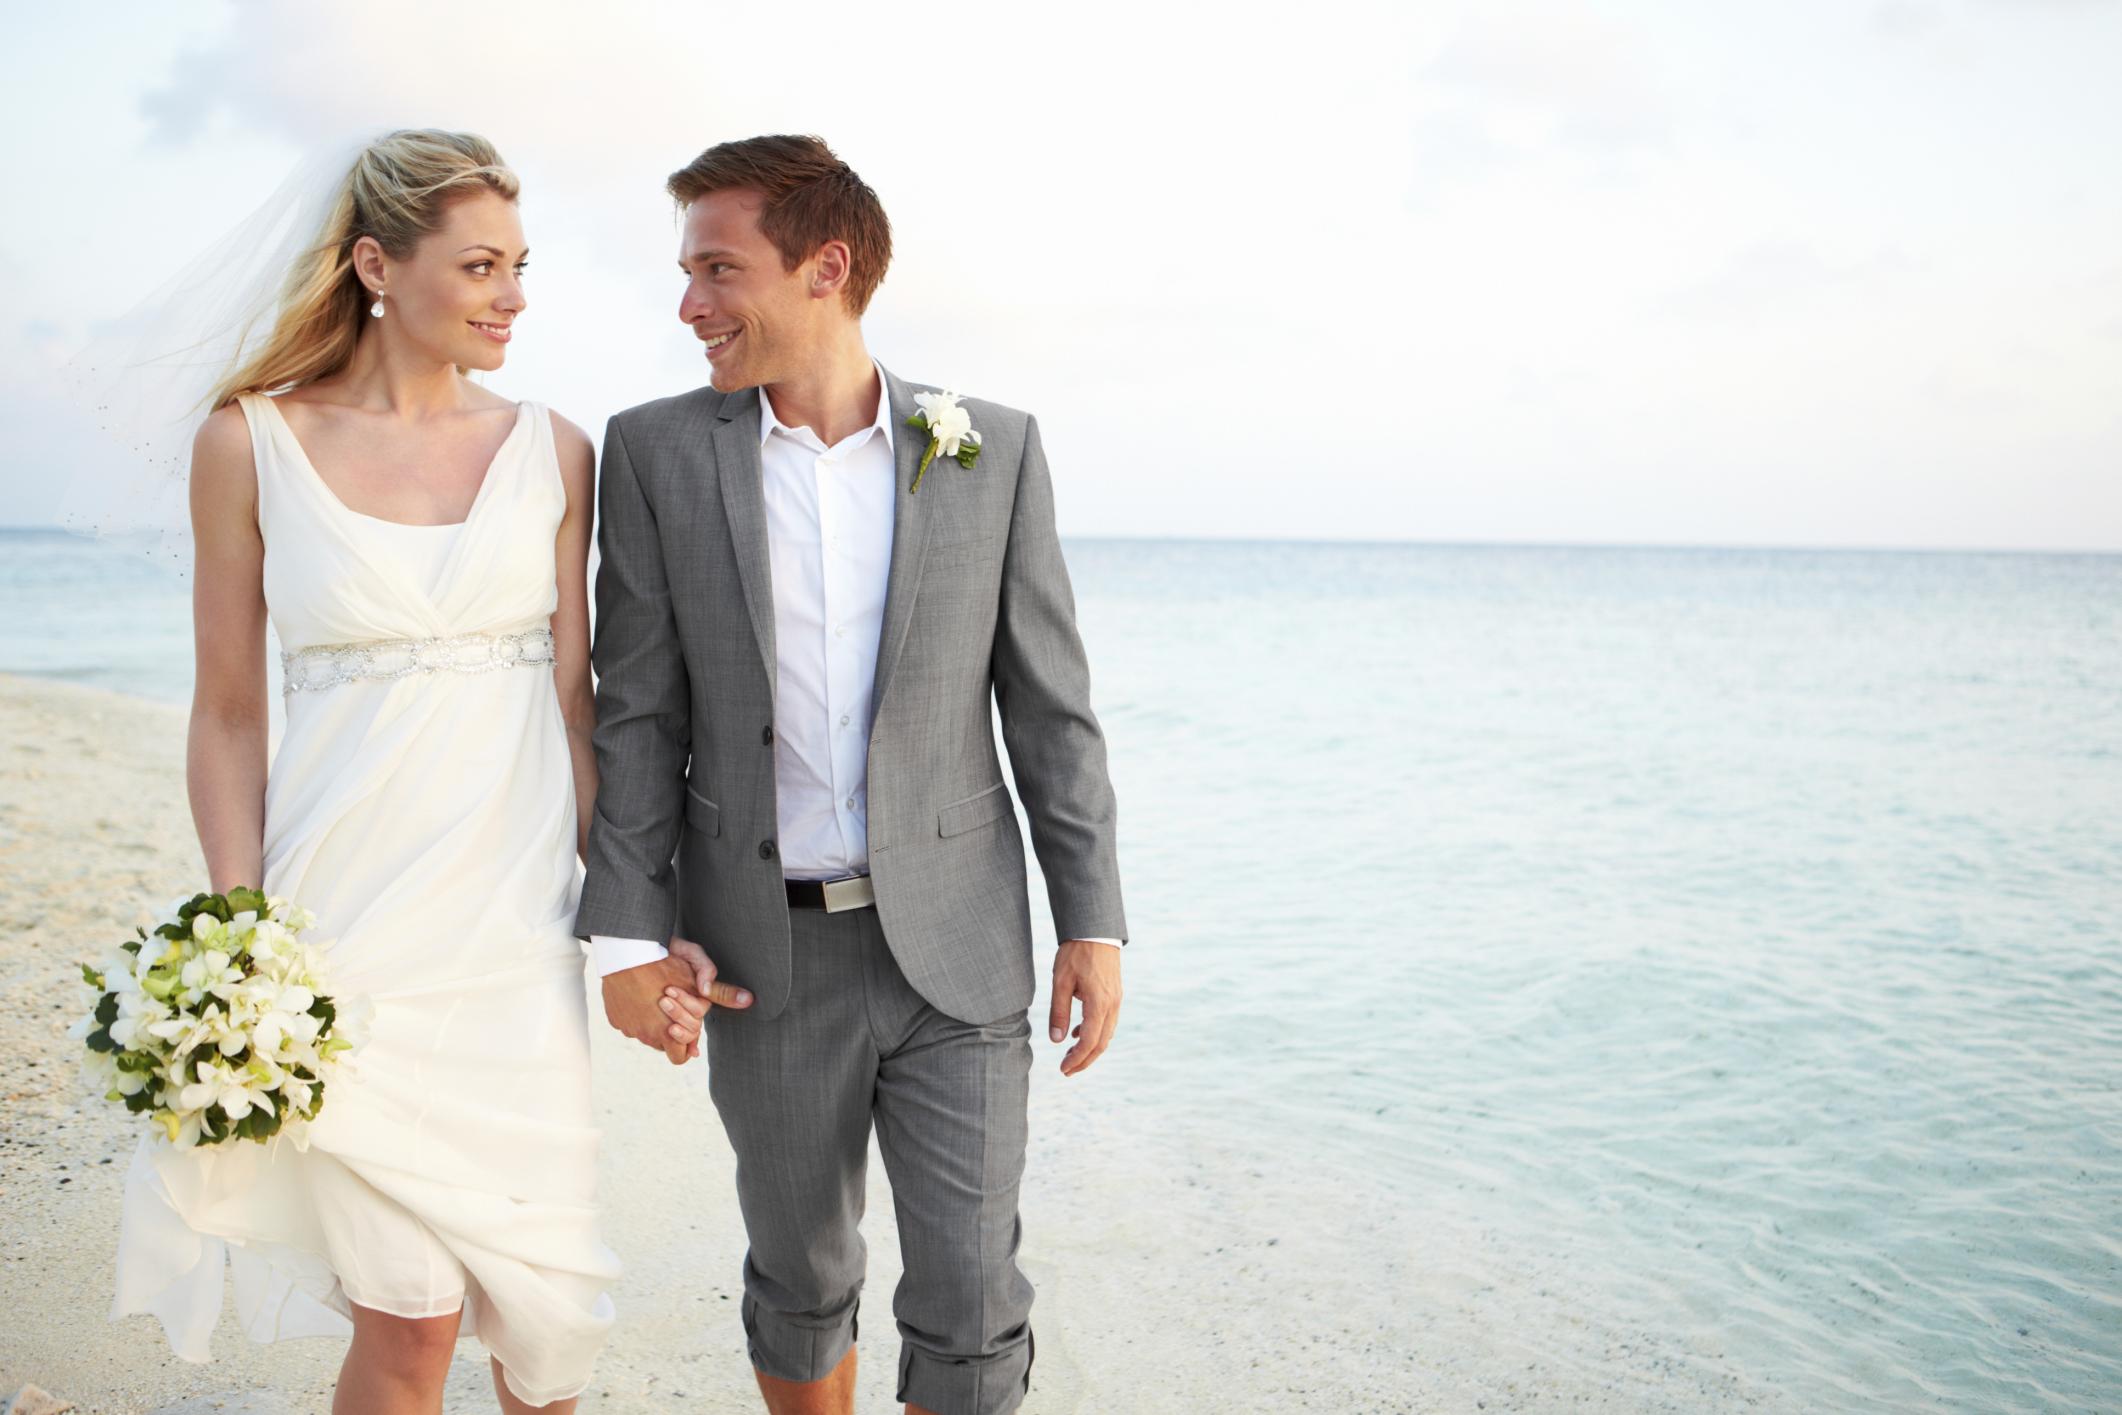 Mens Beach Wedding Attire.Mens Wedding Fashion Articles Easy Weddings